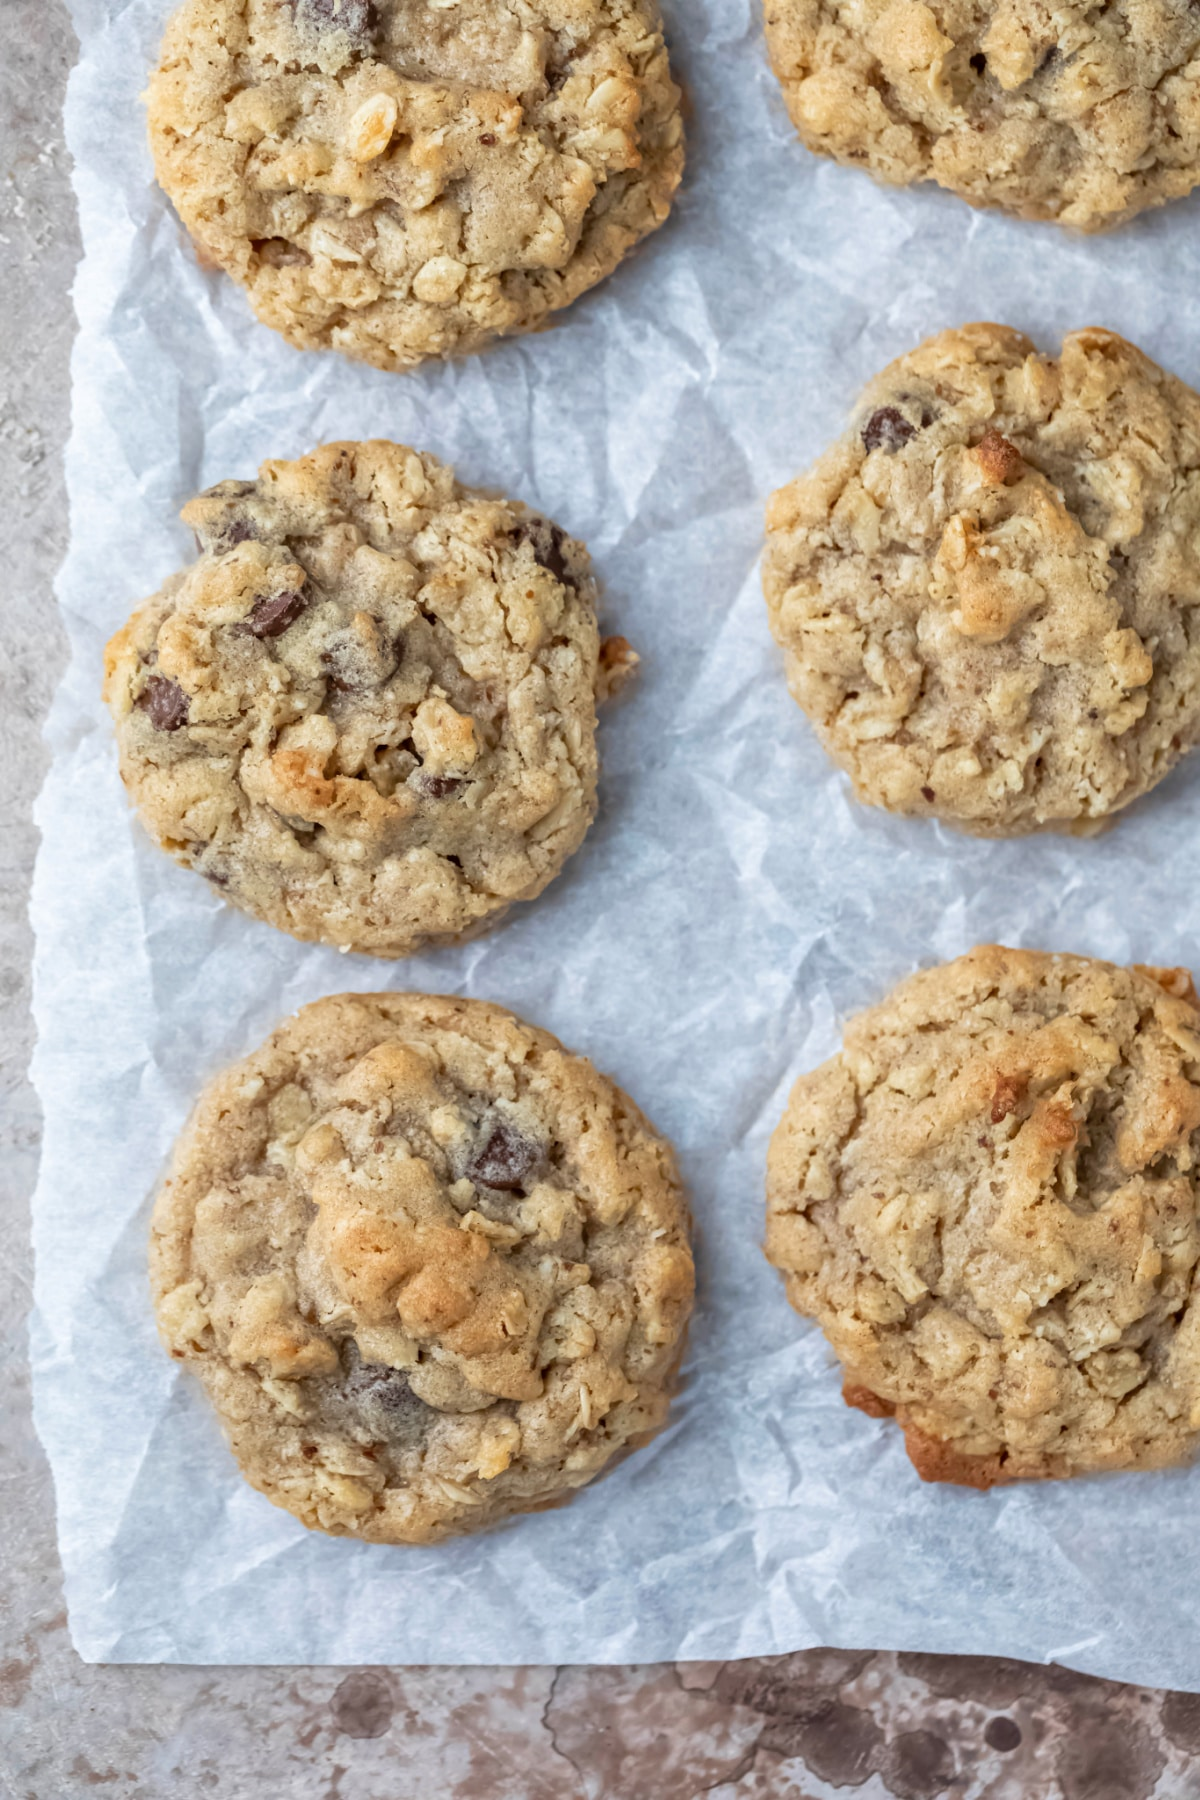 six lactation cookies on a piece of parchment paper